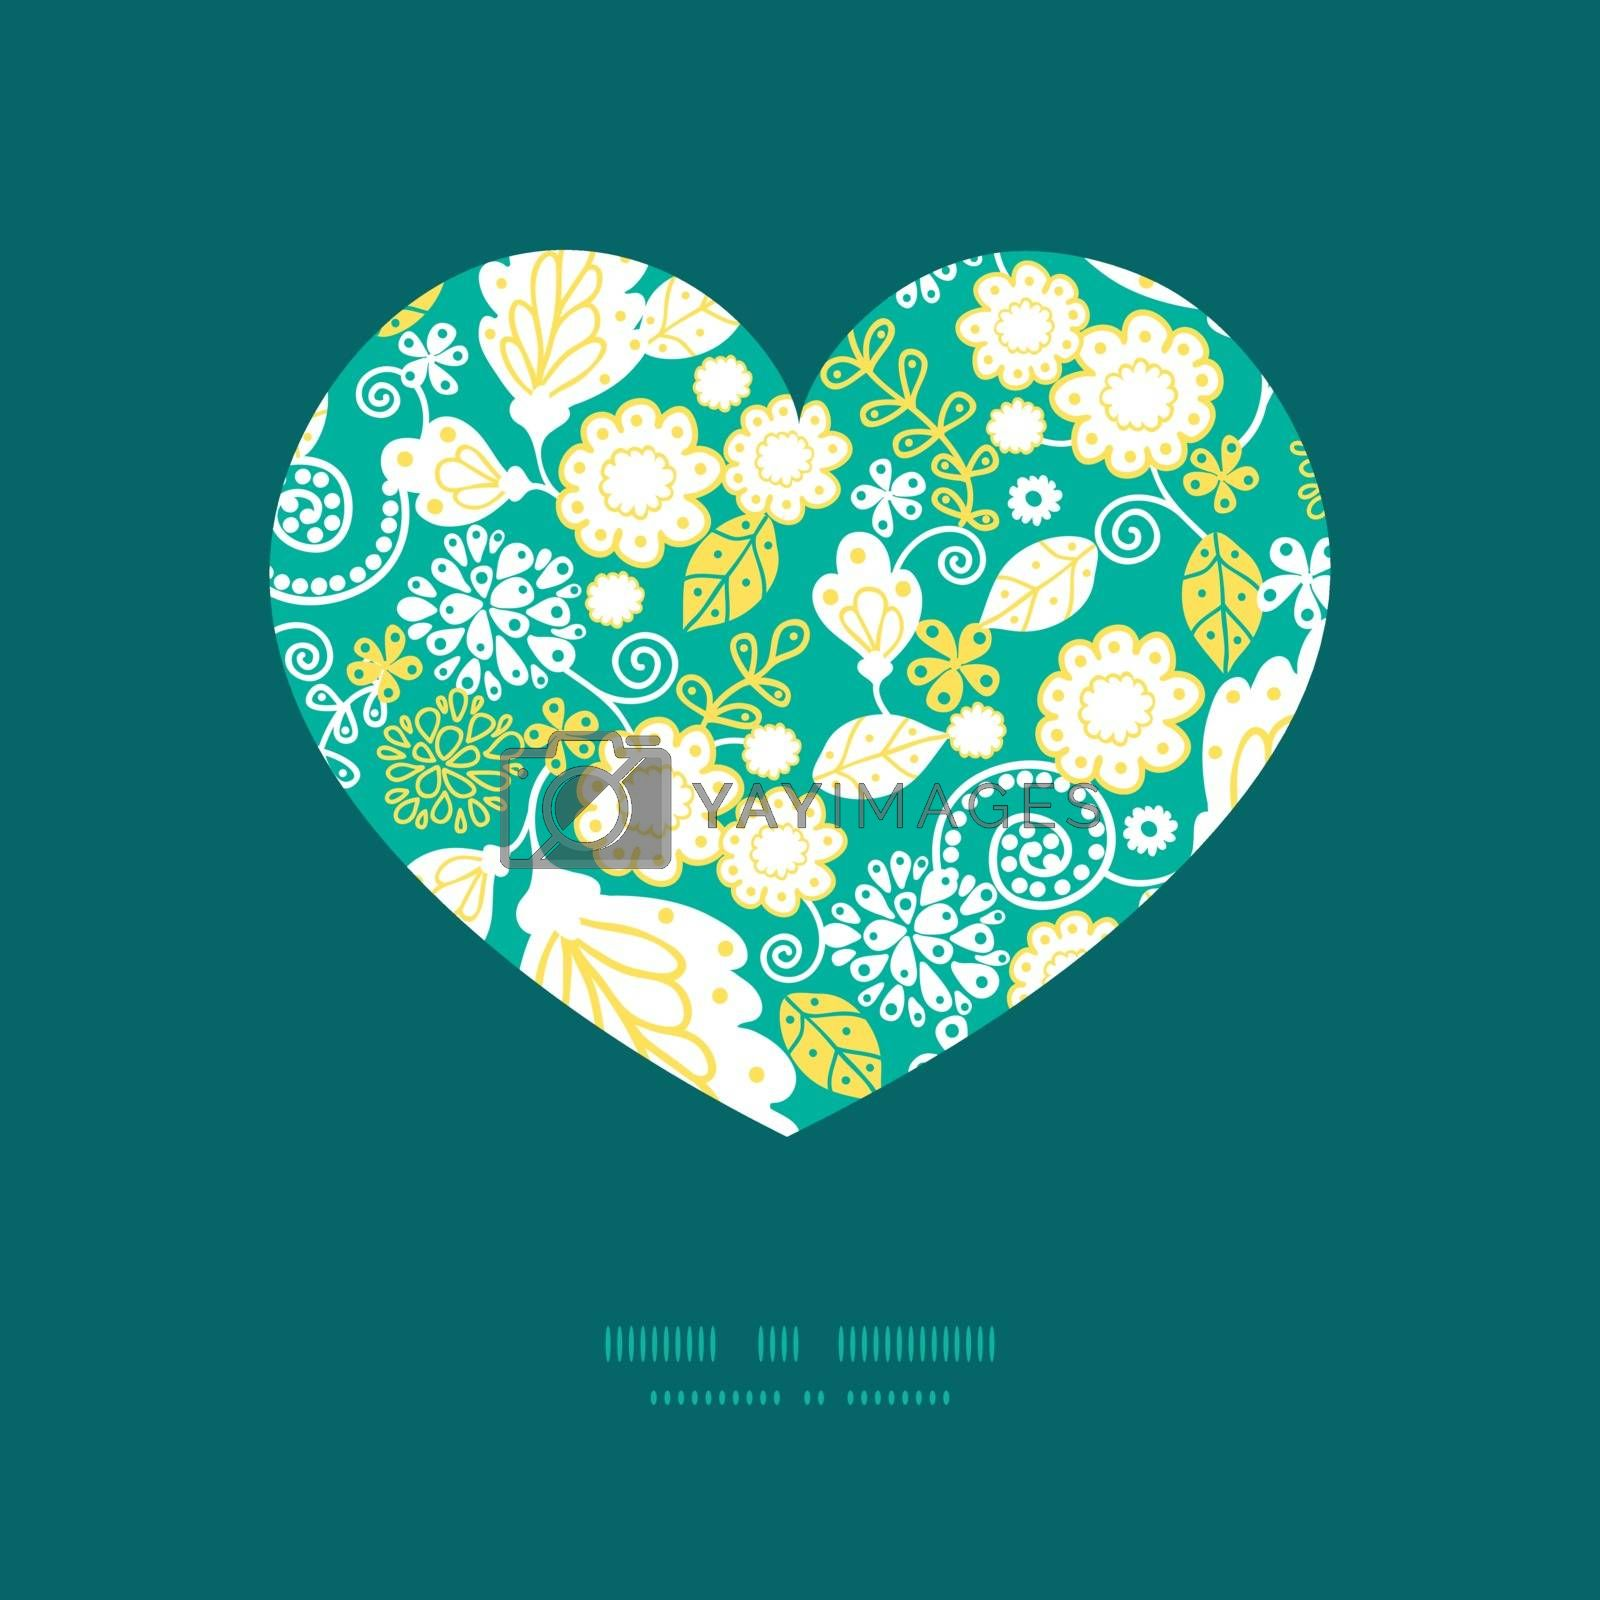 Vector emerald flowerals heart silhouette pattern frame graphic design